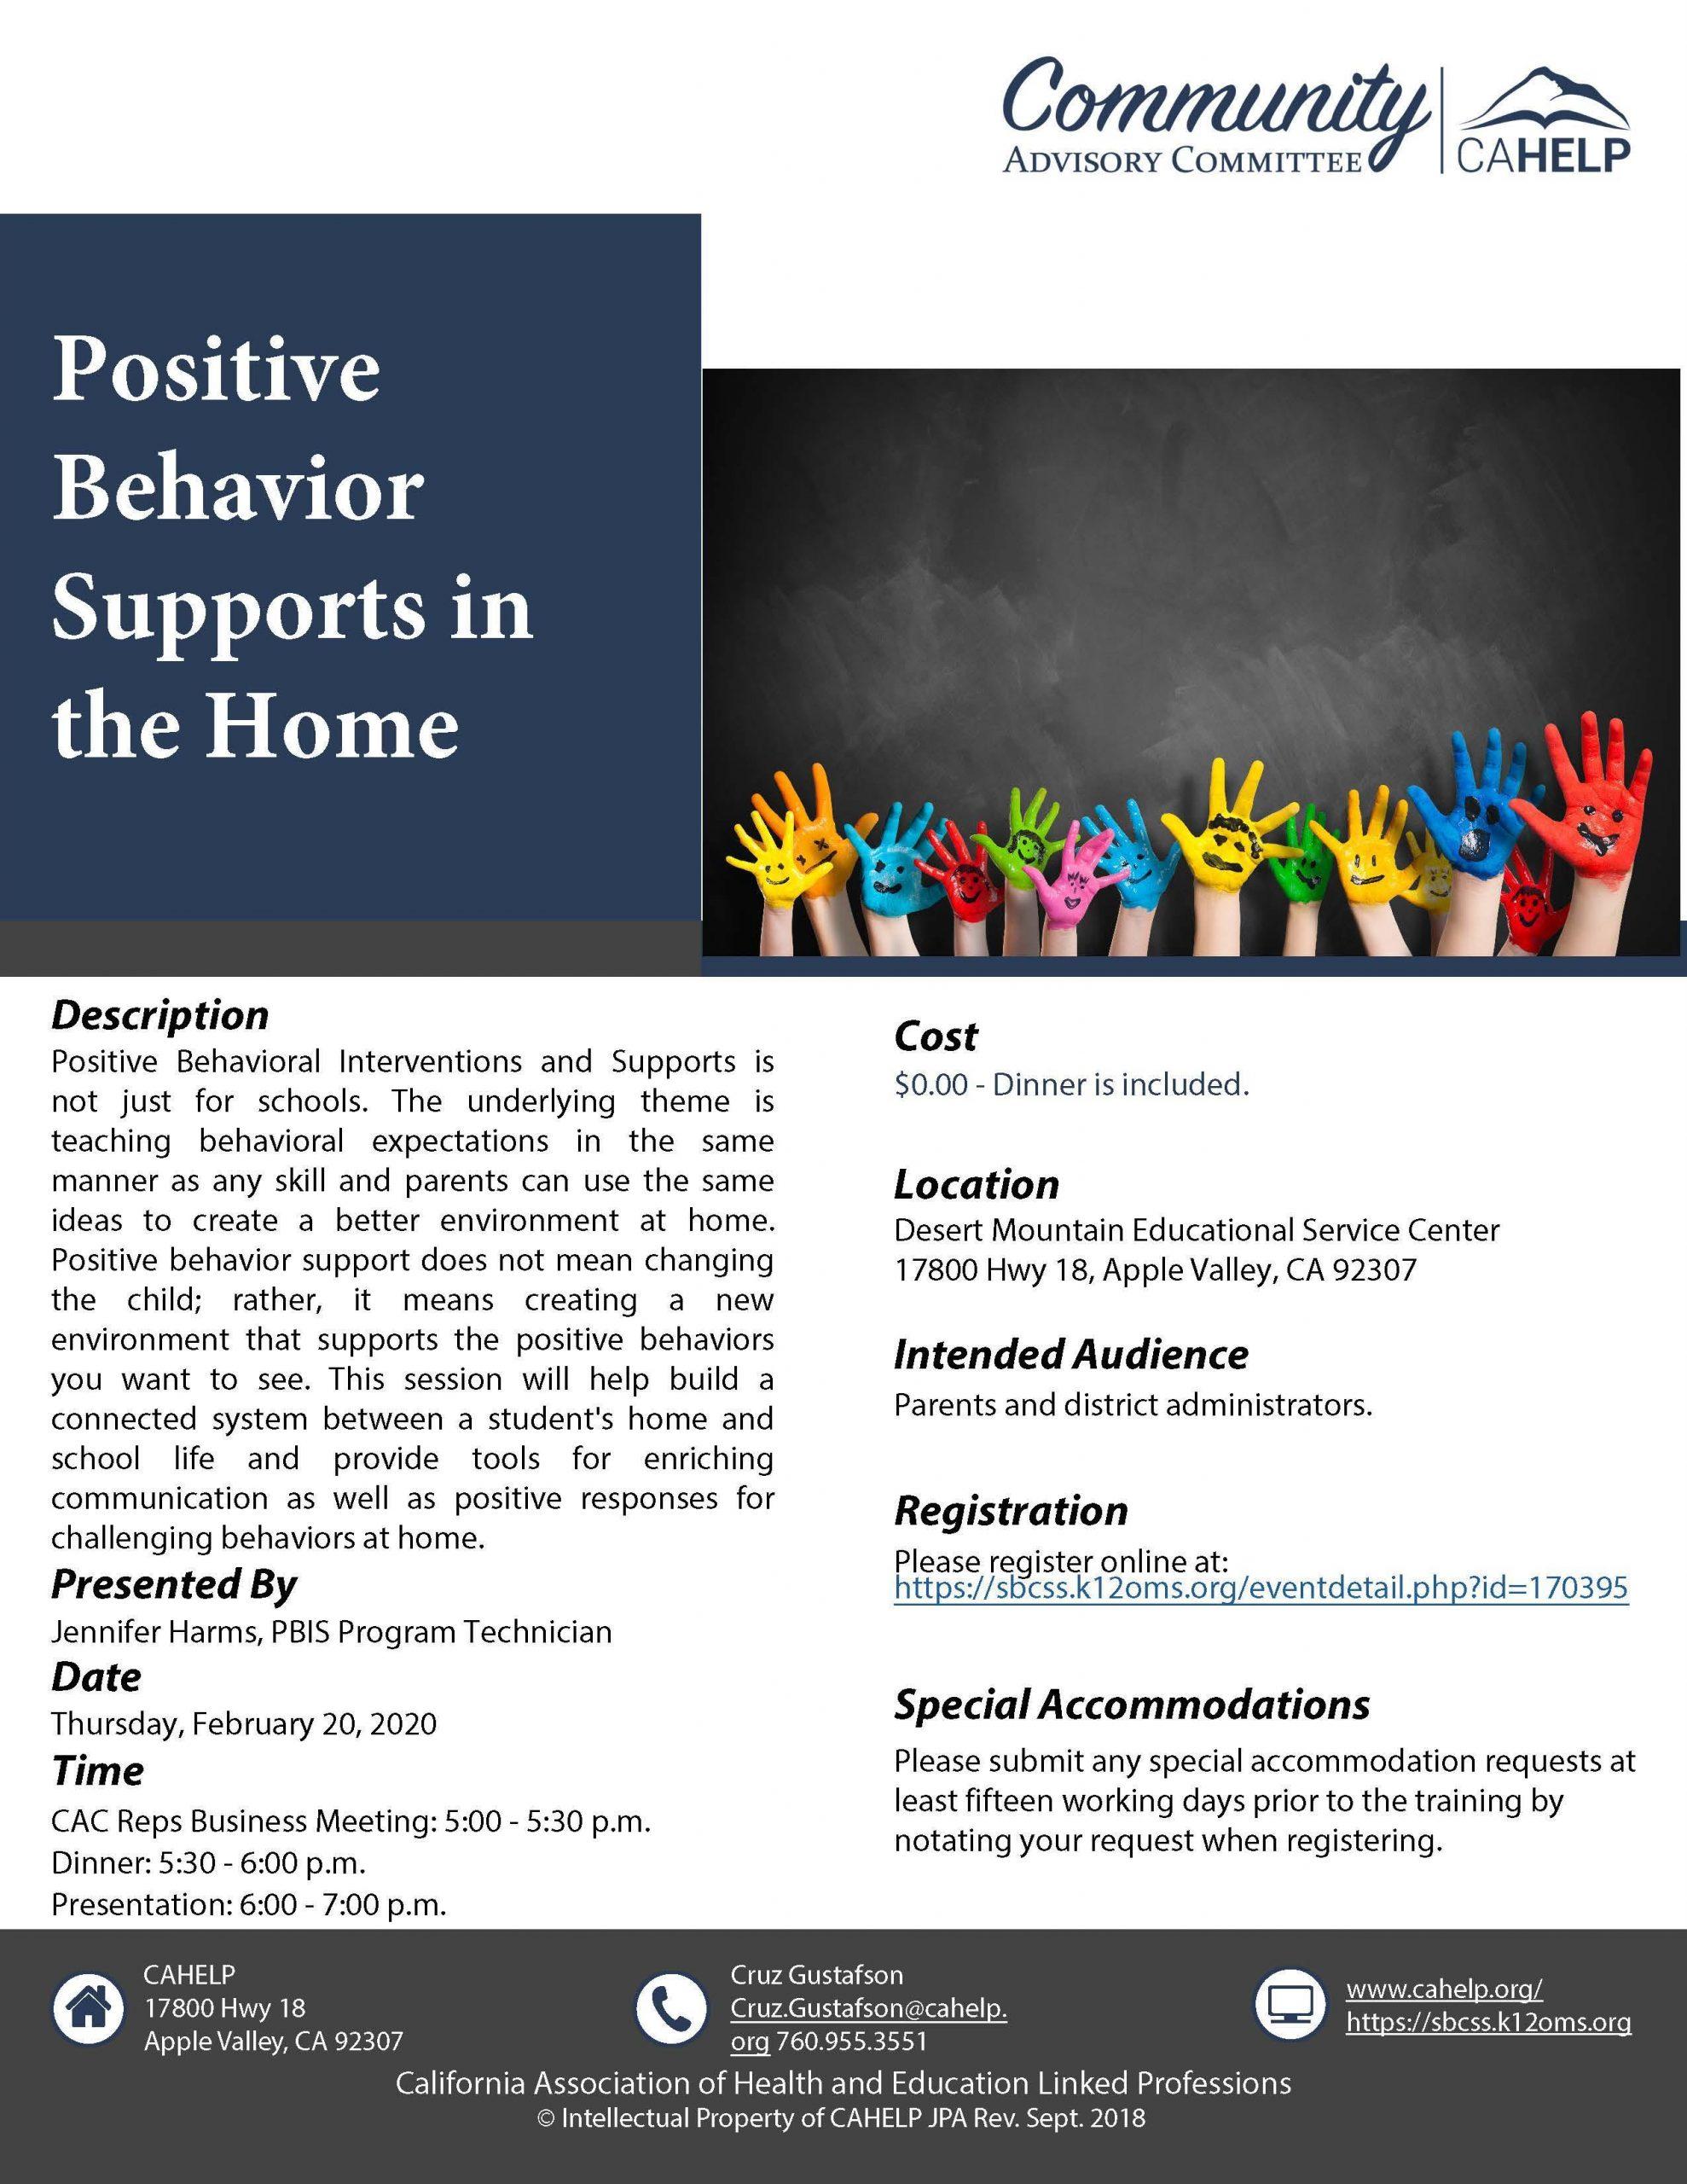 Positive Behavior Presentation By Cahelp